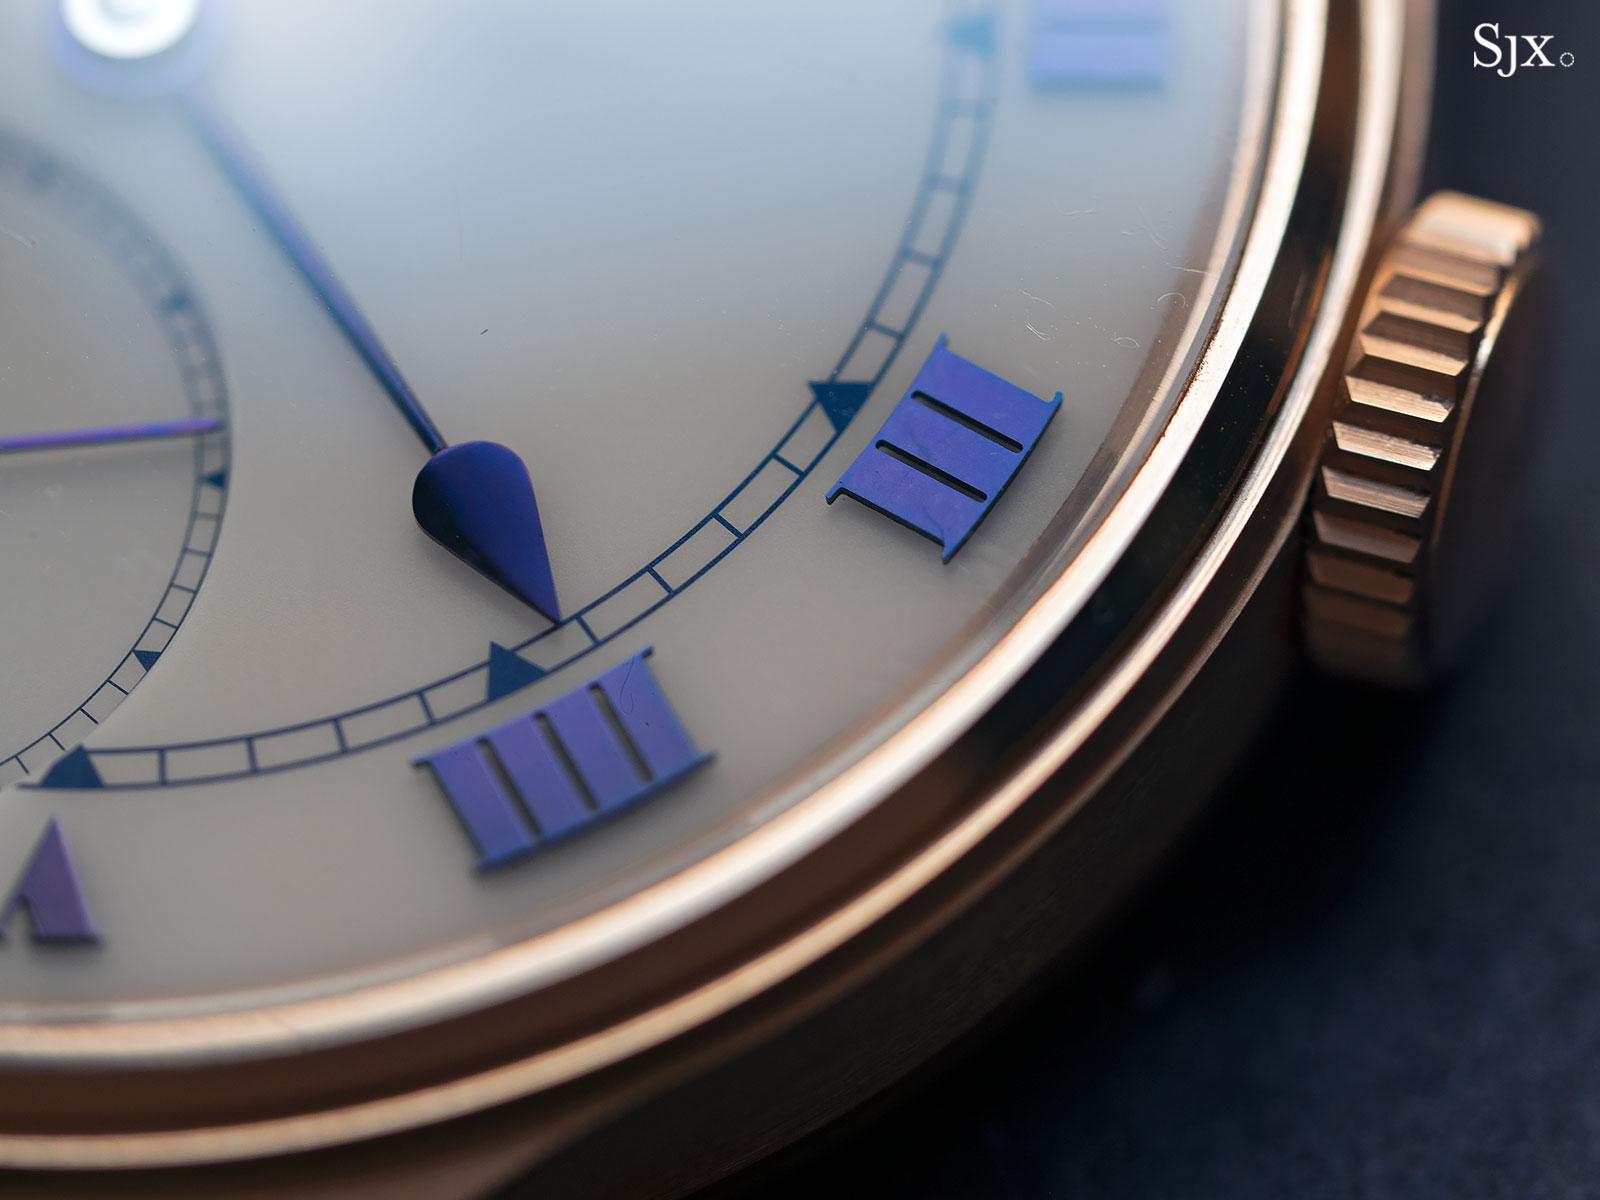 Frodsham Double Impulse chronometer rose gold 5